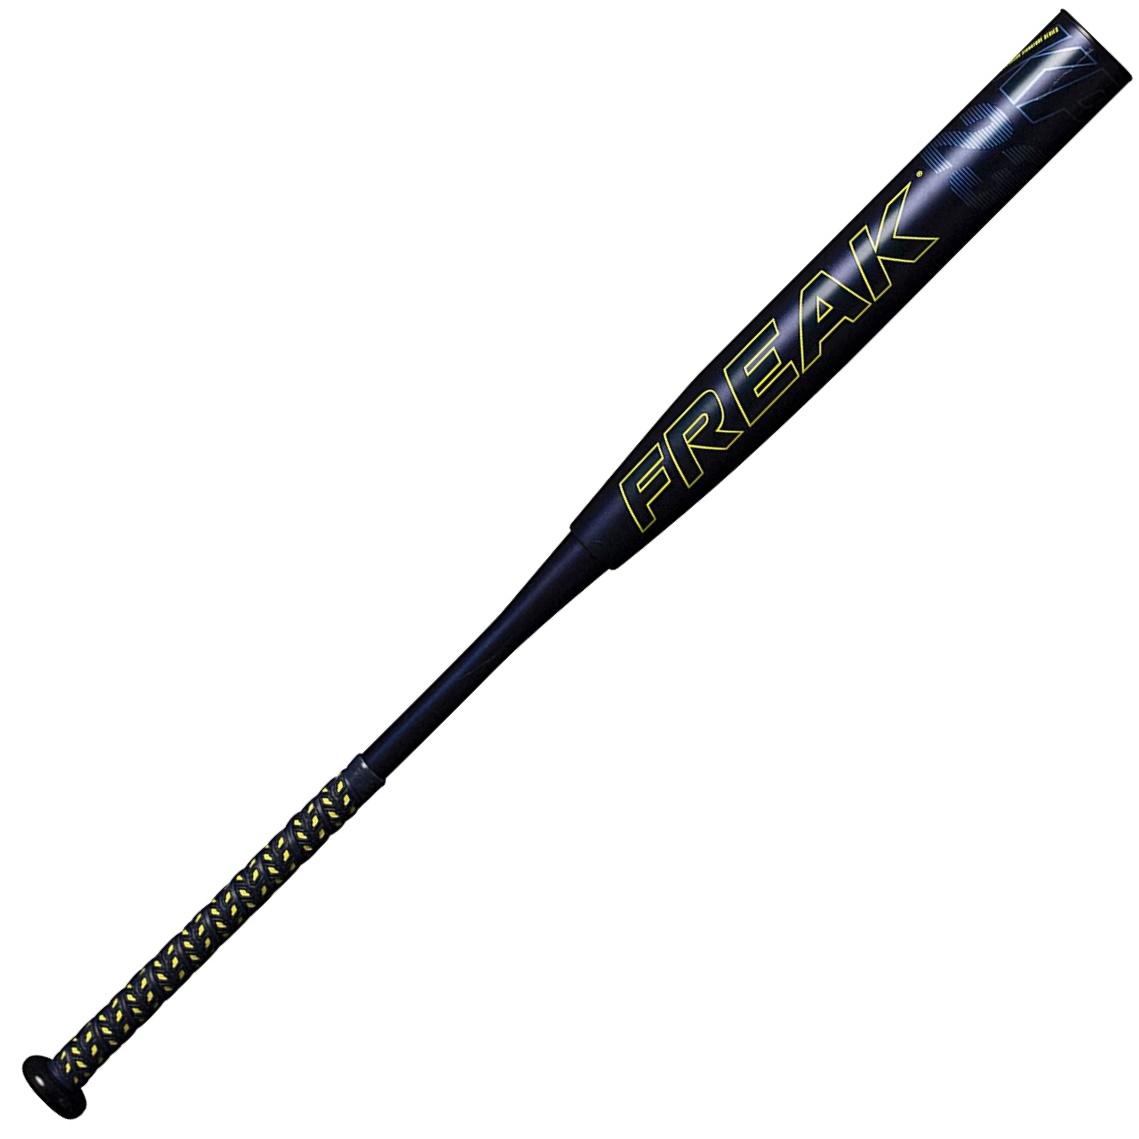 miken-kyle-pearson-freak-23-12-usa-asa-maxload-slowpitch-softball-bat-34-inch-28-oz MKP21A-3-28   In addition the Flex 2 Power F2P handle optimizes handle flex